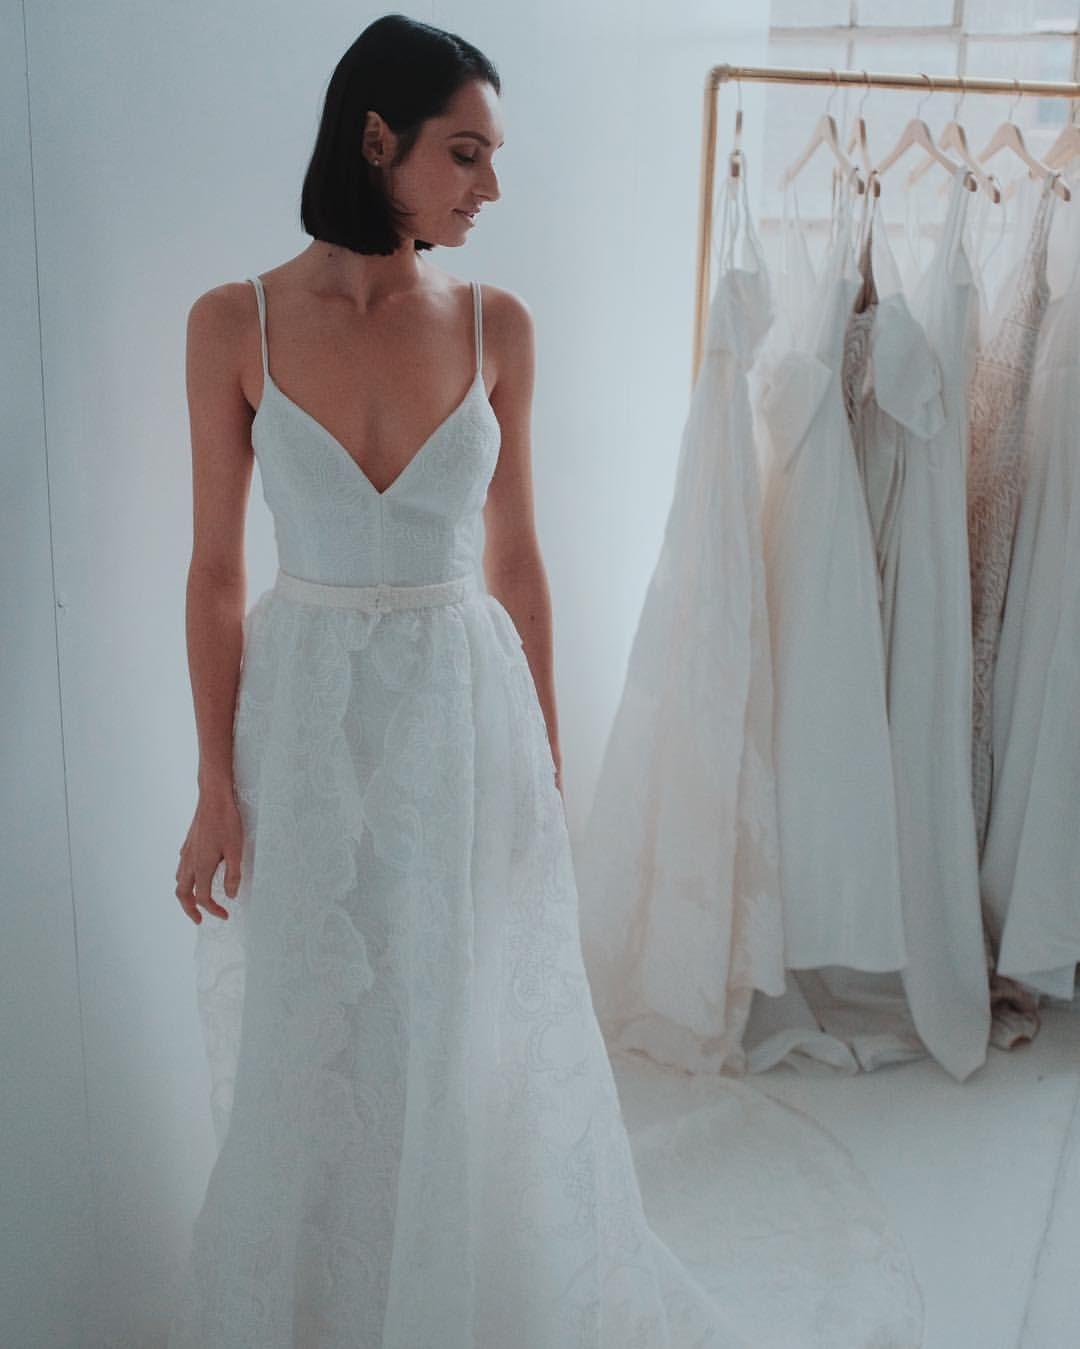 Wedding Gowns Knoxville Tn: Knoxville Bridal Studio (@kindredbridal) • Instagram